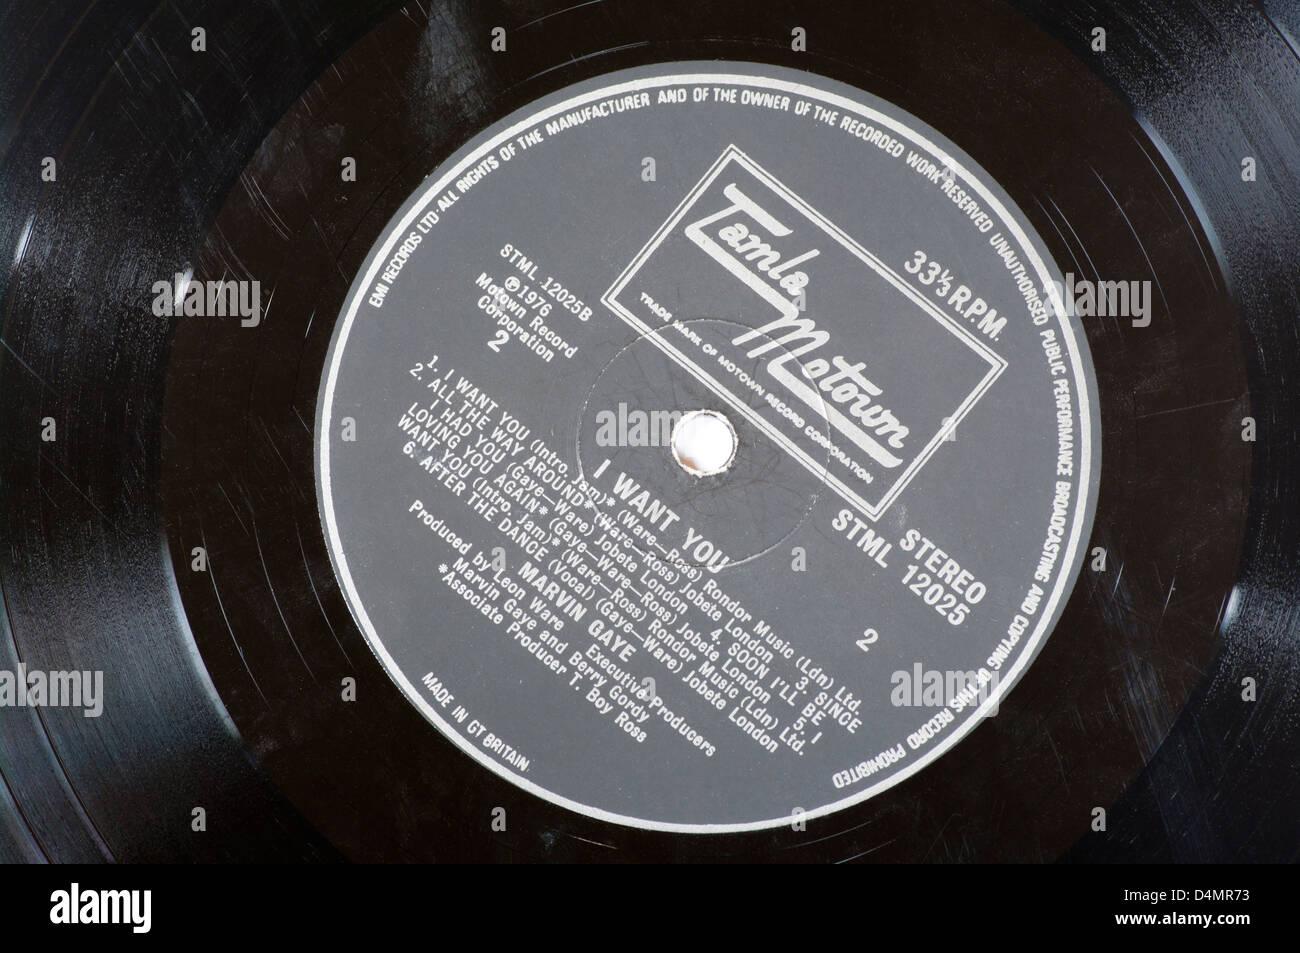 Tamla Motown Record Label On A Vinyl Lp Record Stock Photo